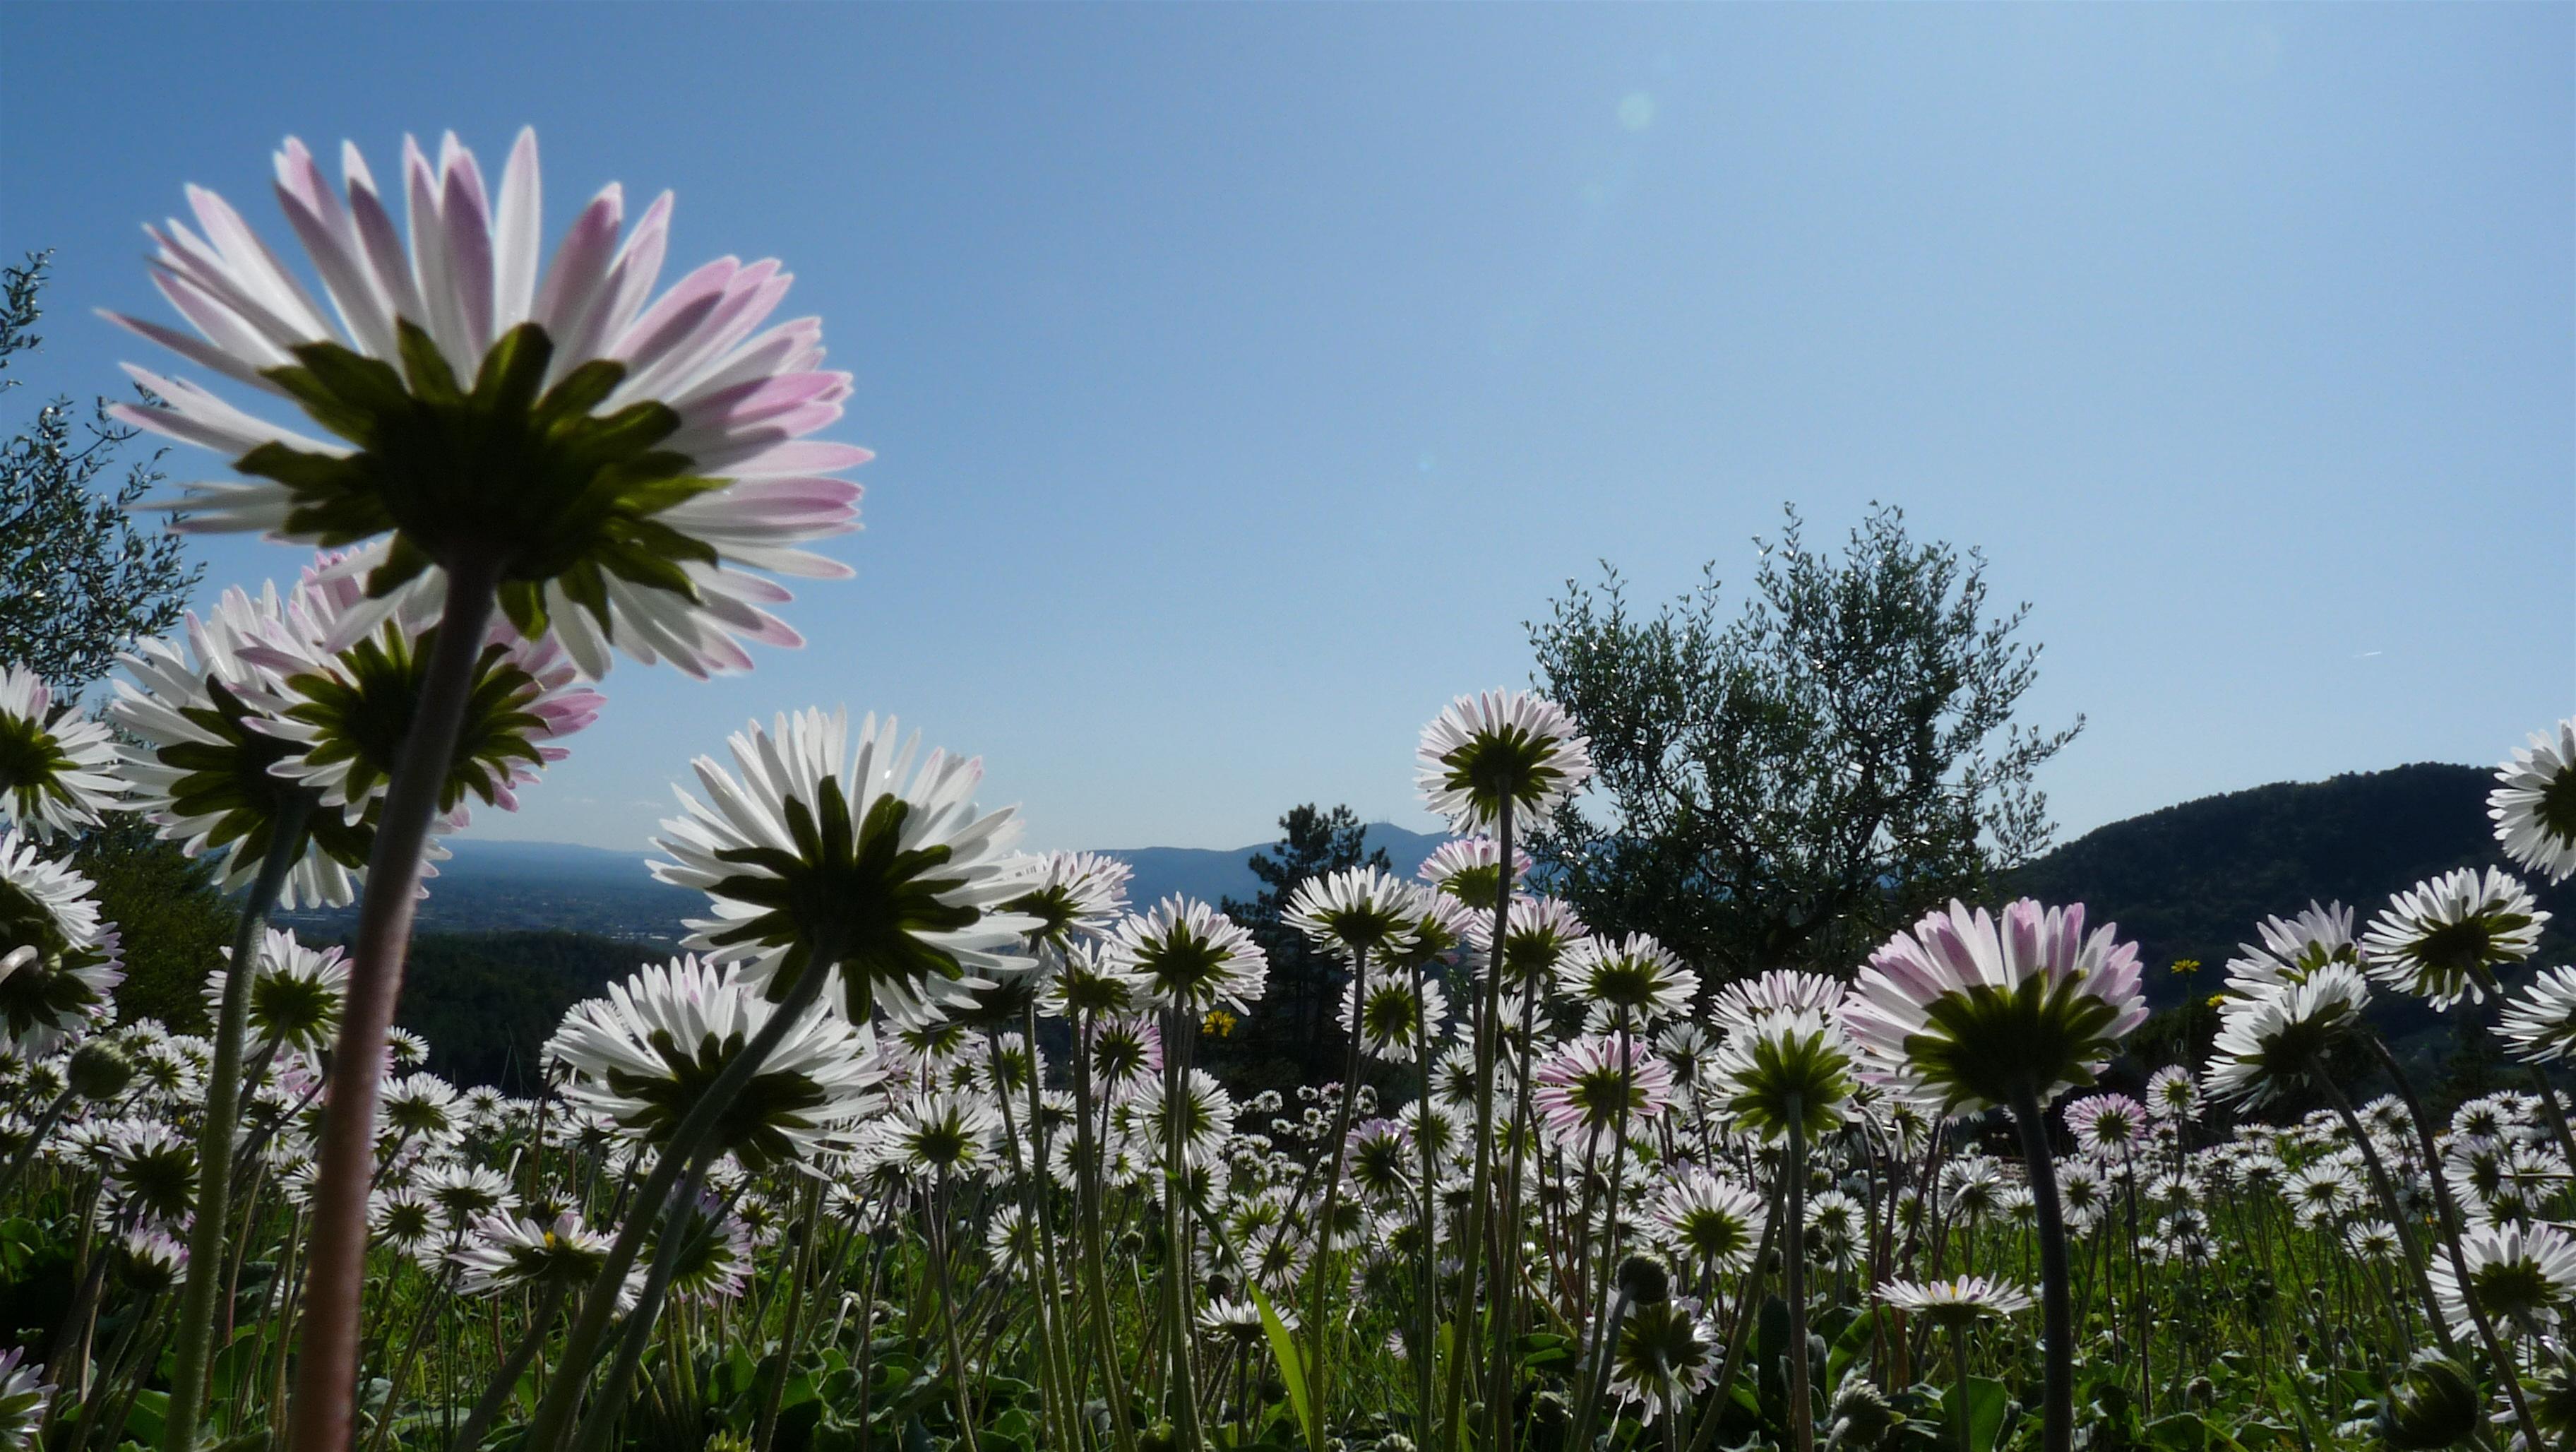 Among daisies